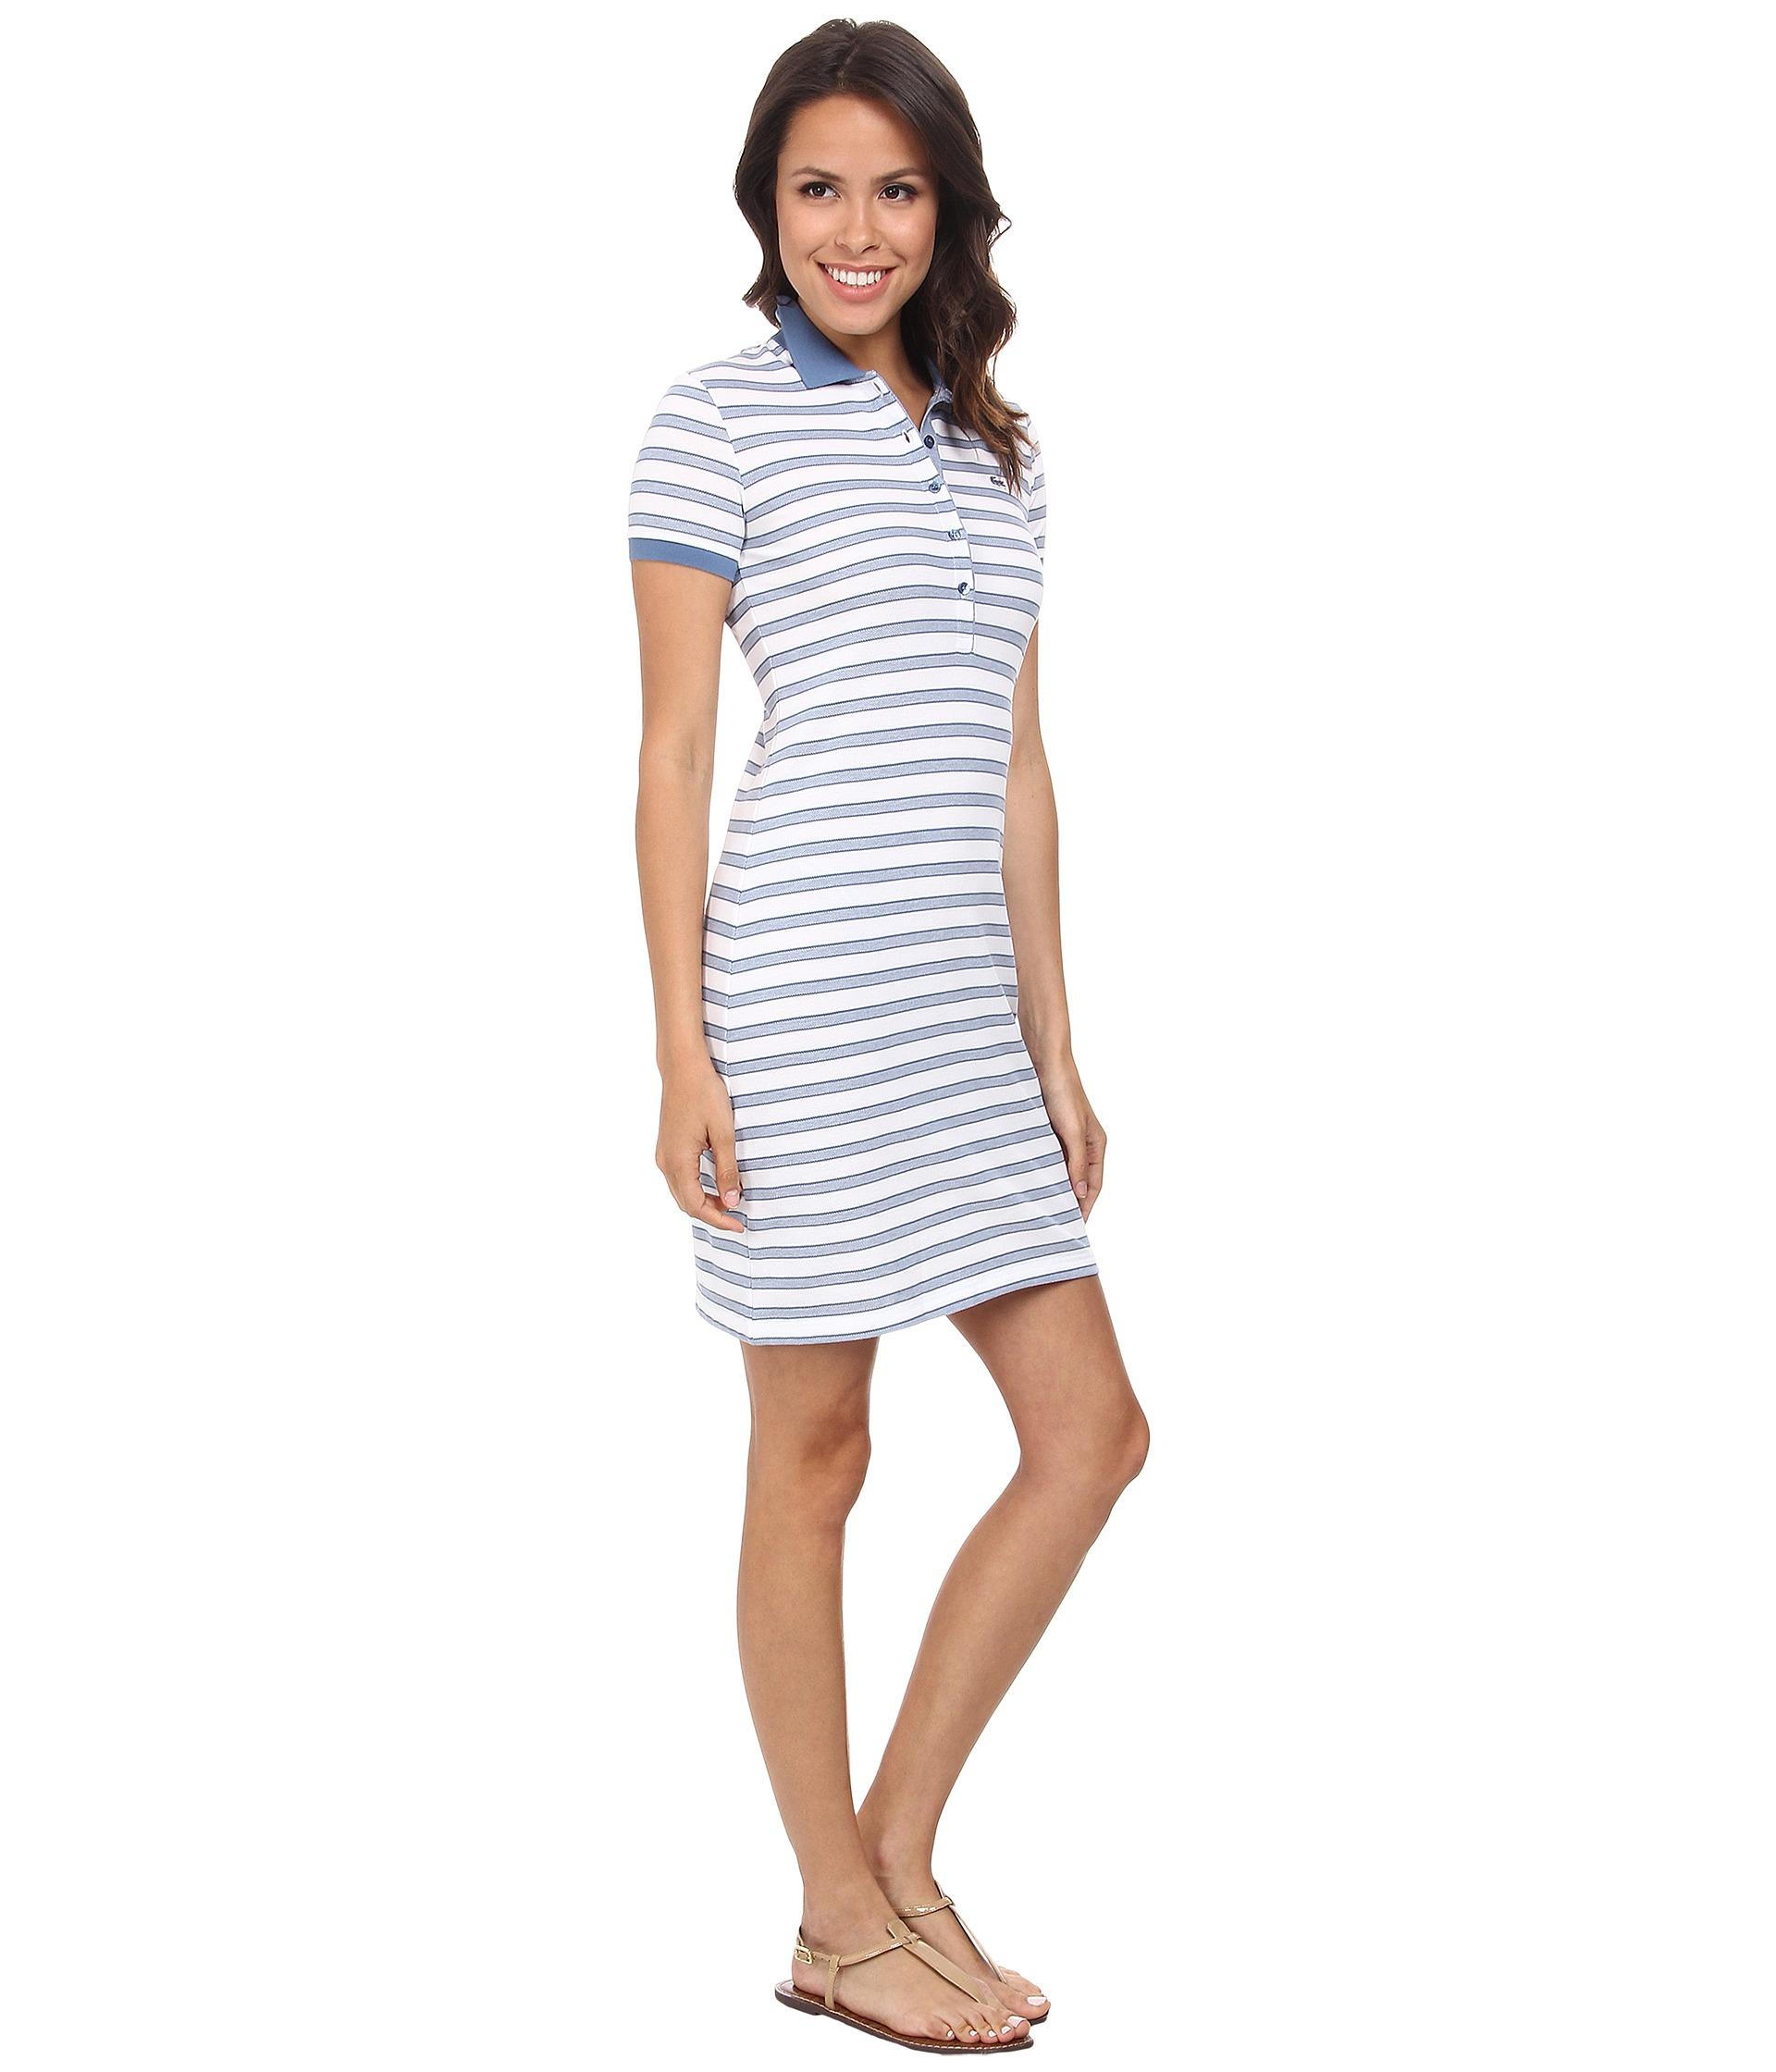 dc4b5e31d2954c Lyst - Lacoste Short Sleeve Stripe Pique Polo Dress in White